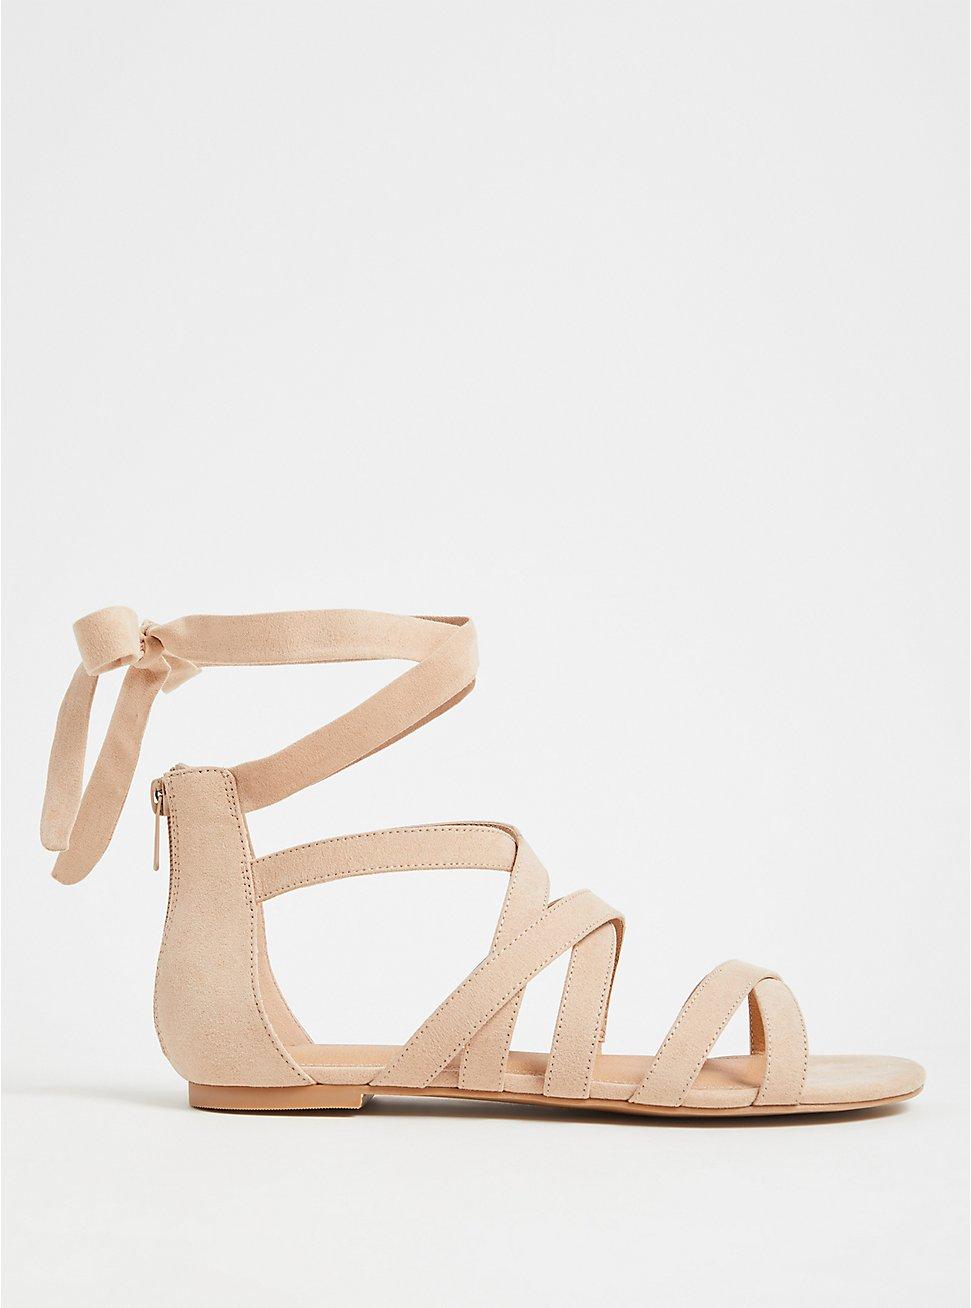 Beige Faux Suede Lace-Up Gladiator Sandals (WW), , hi-res